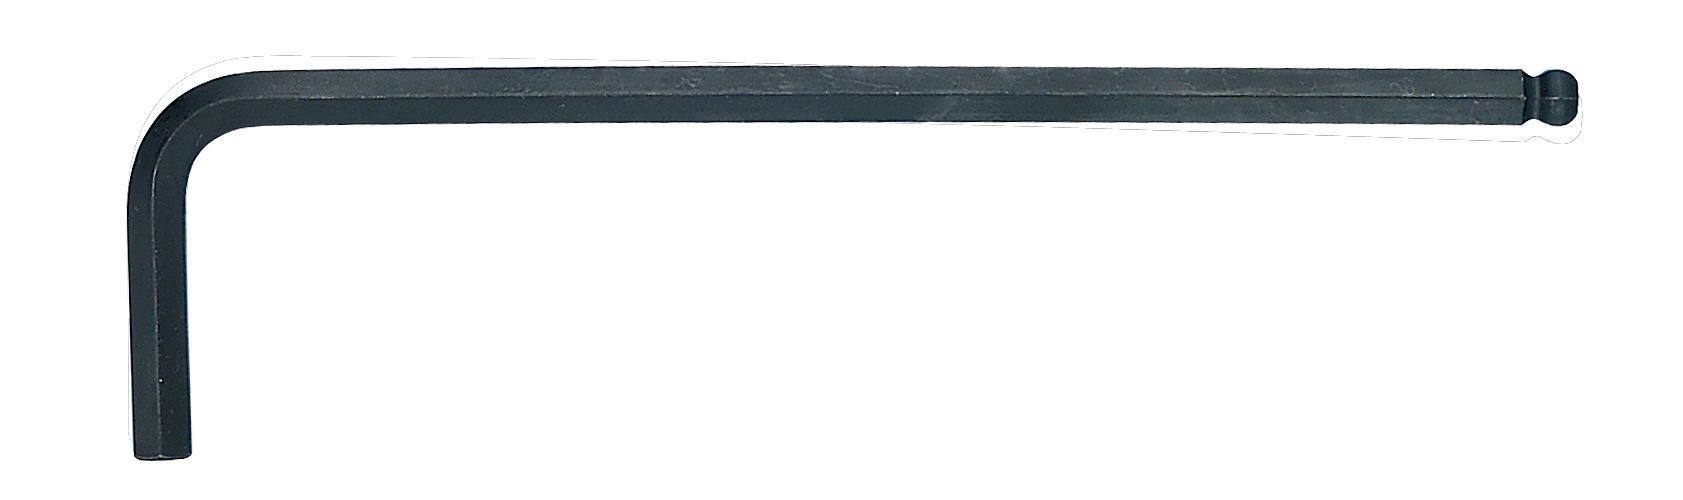 Ключ Felo 35501500